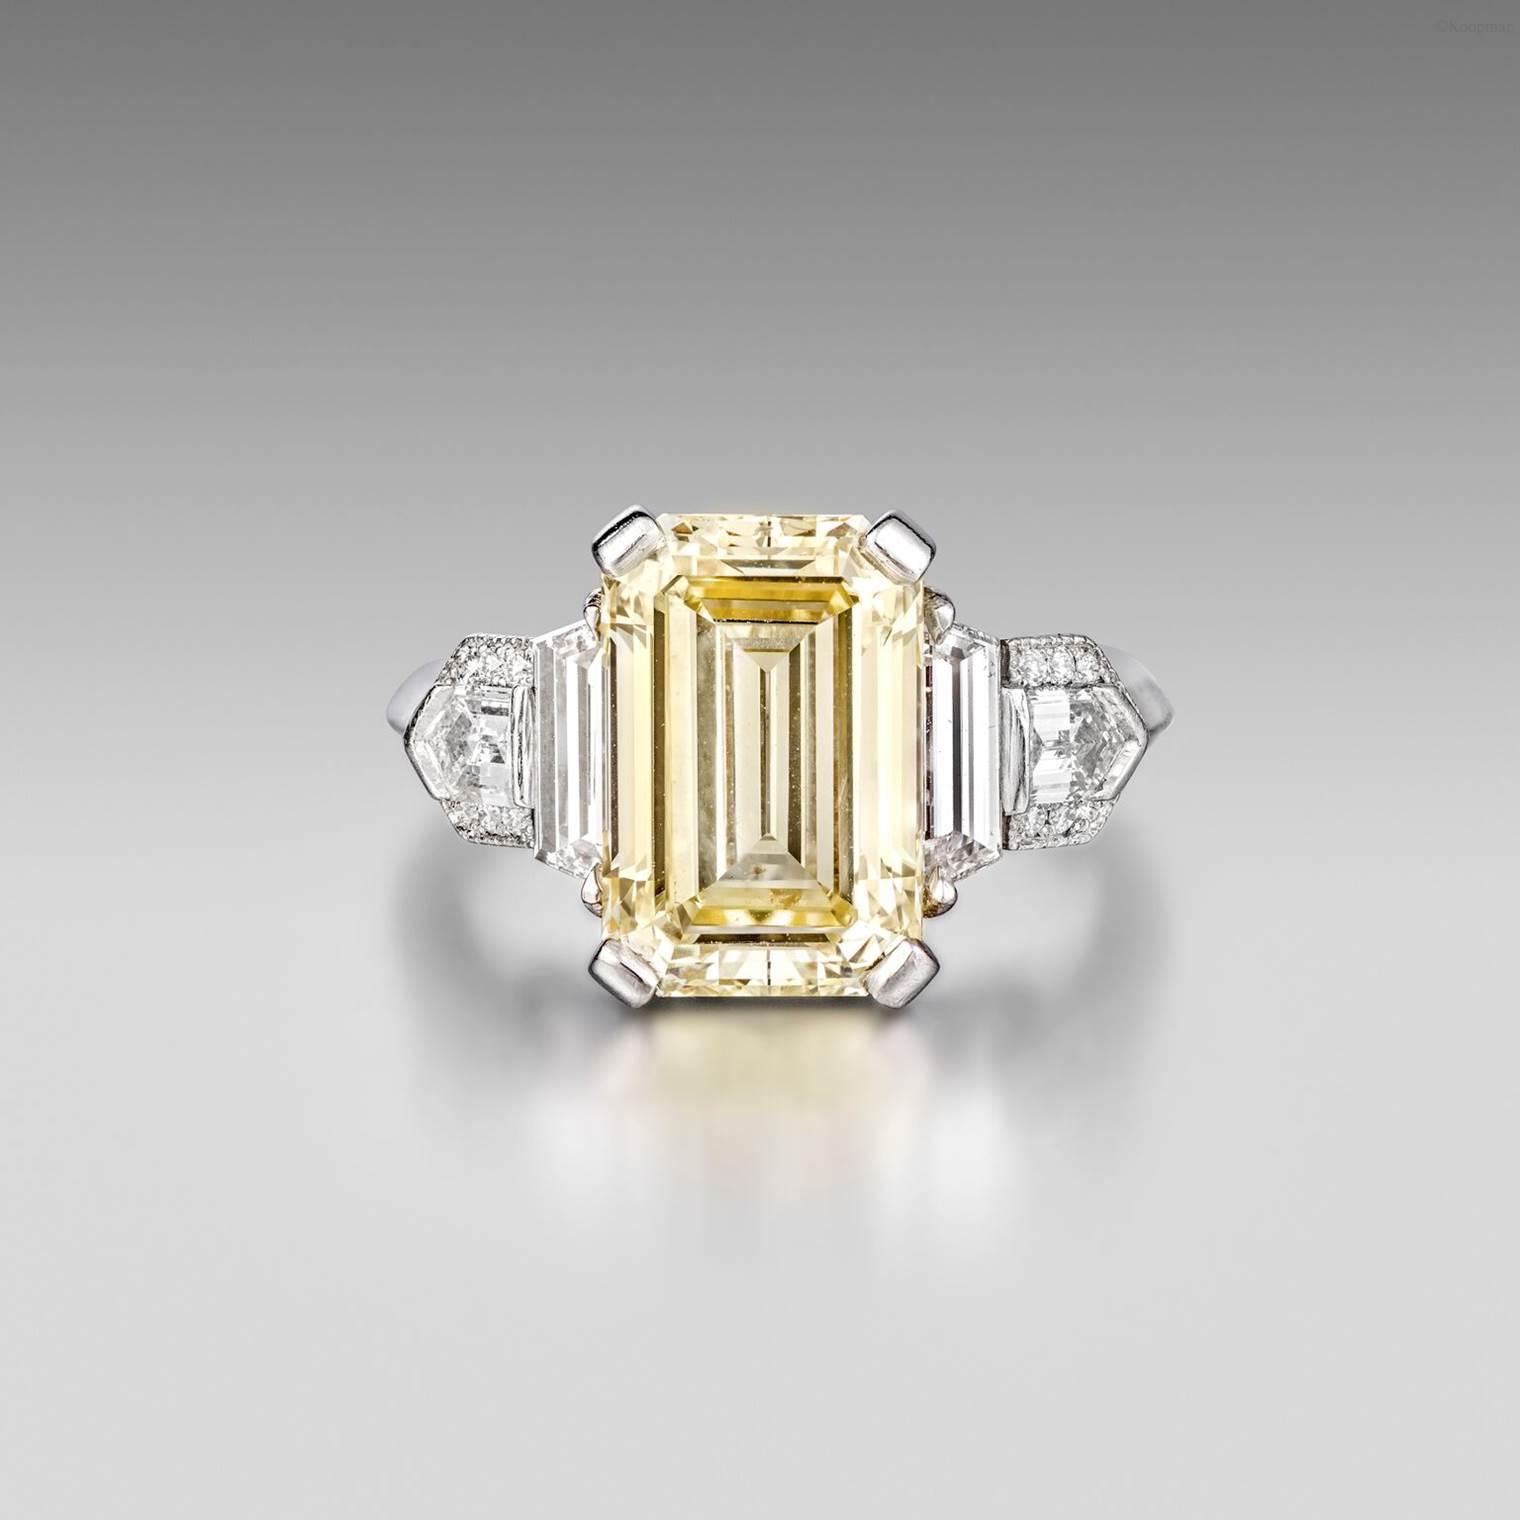 Platinum, Fancy Yellow Diamond and Diamond Art Deco Ring